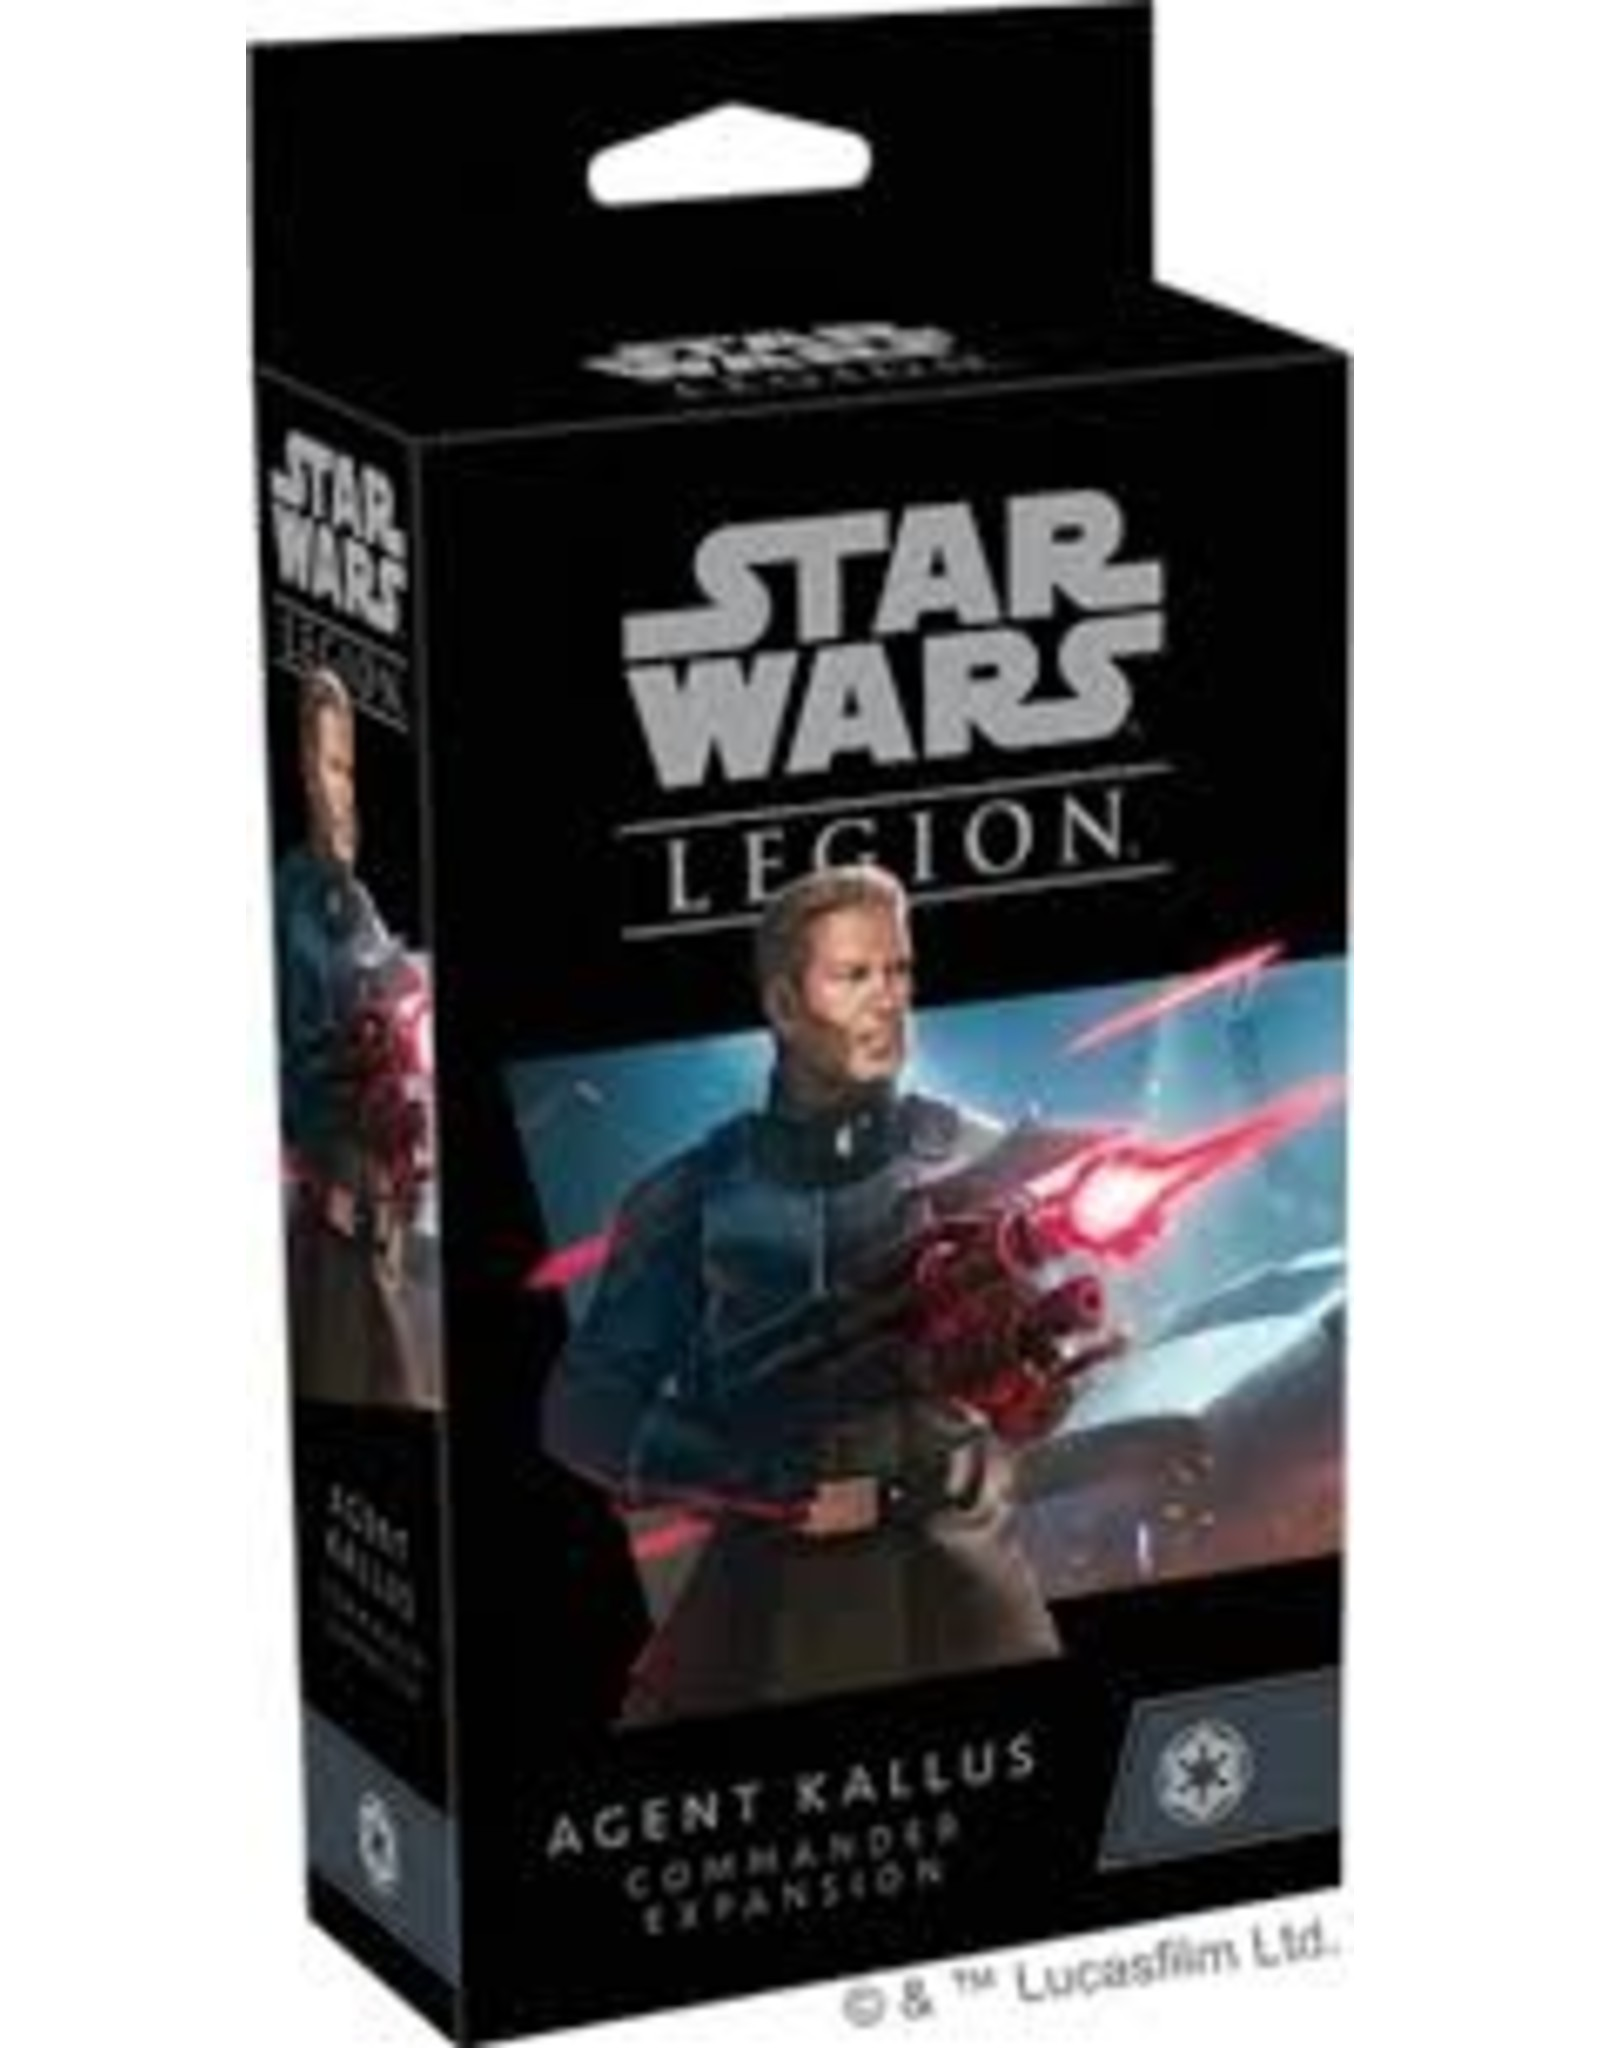 Atomic Mass Games Star Wars Legion: Agent Kallus